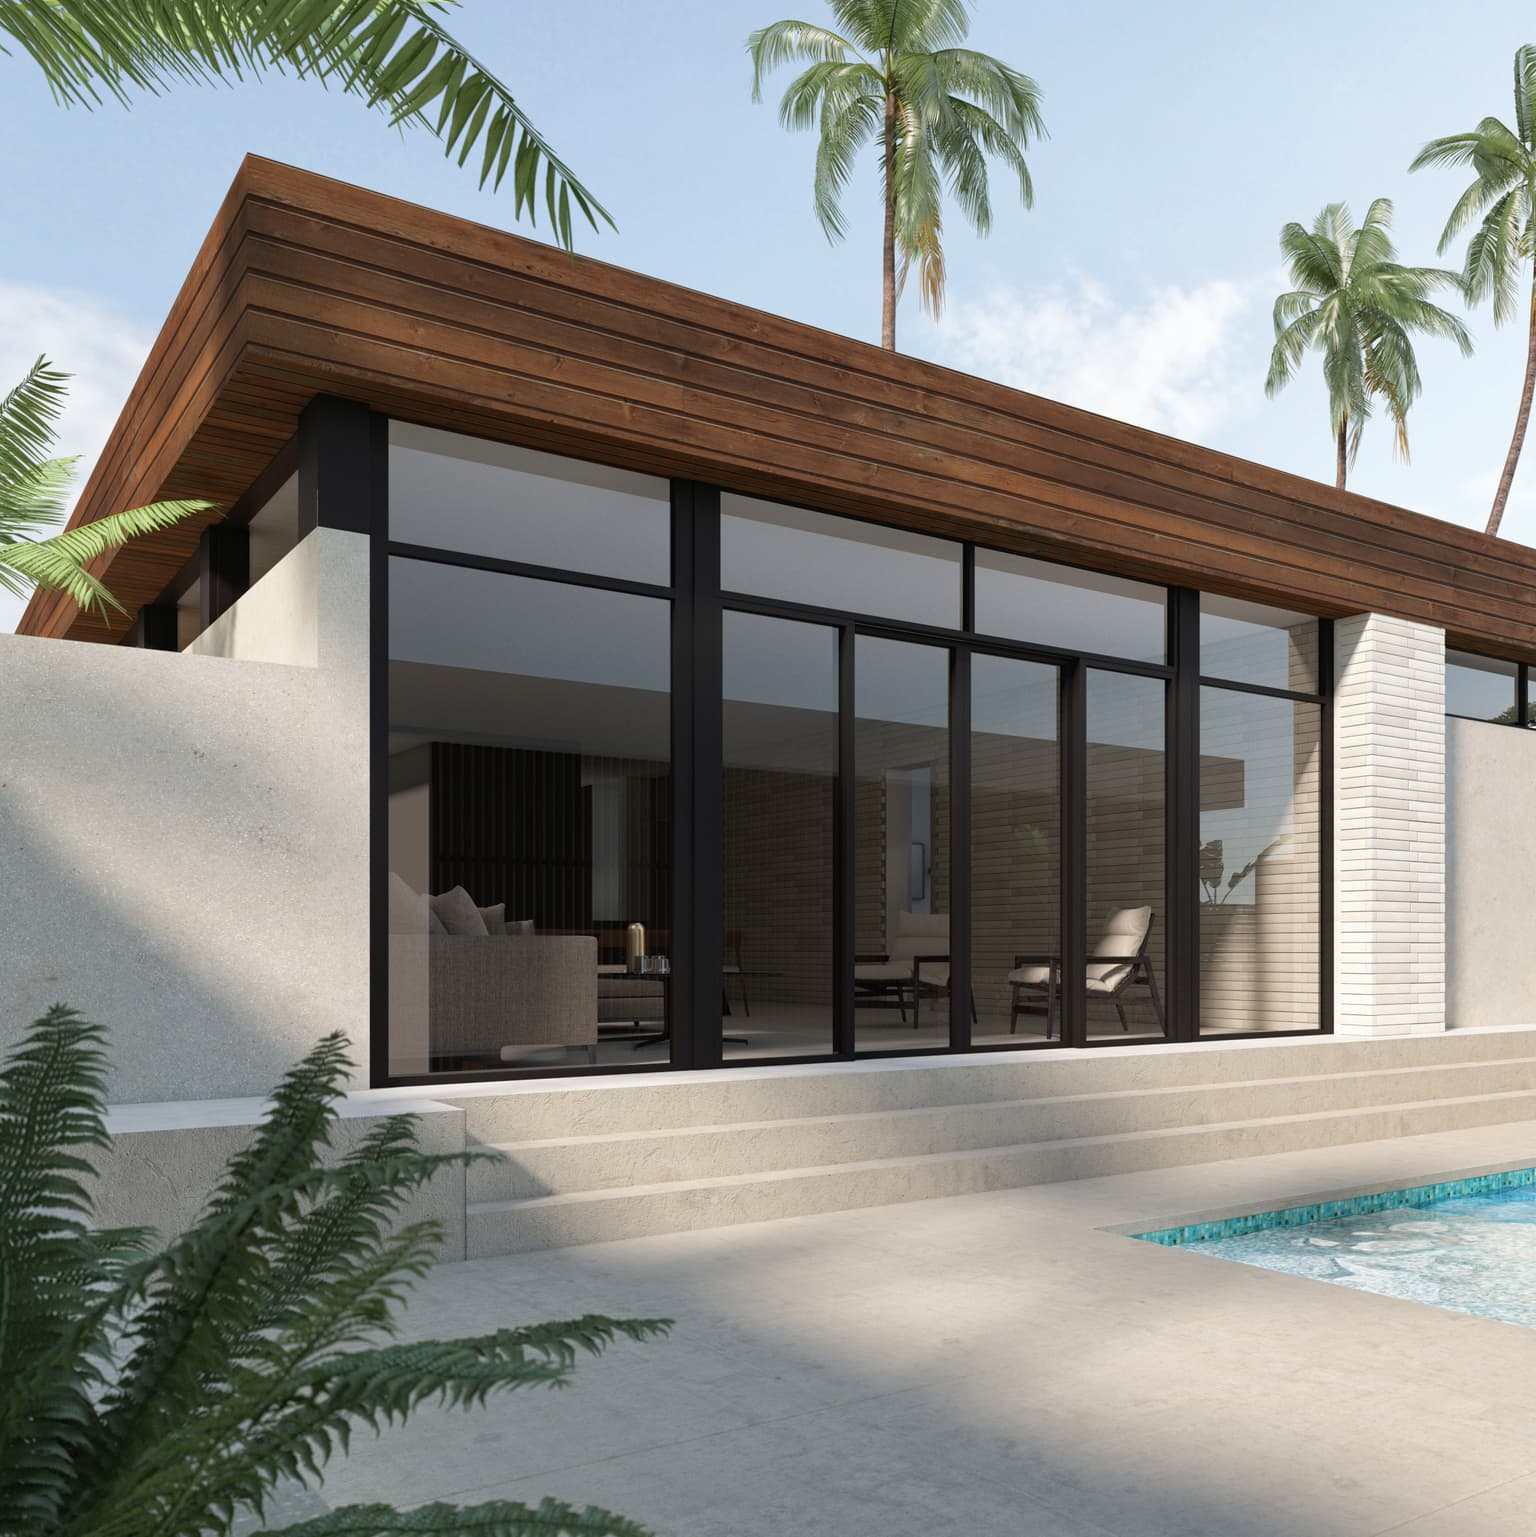 SQ custom home mid-century modern design